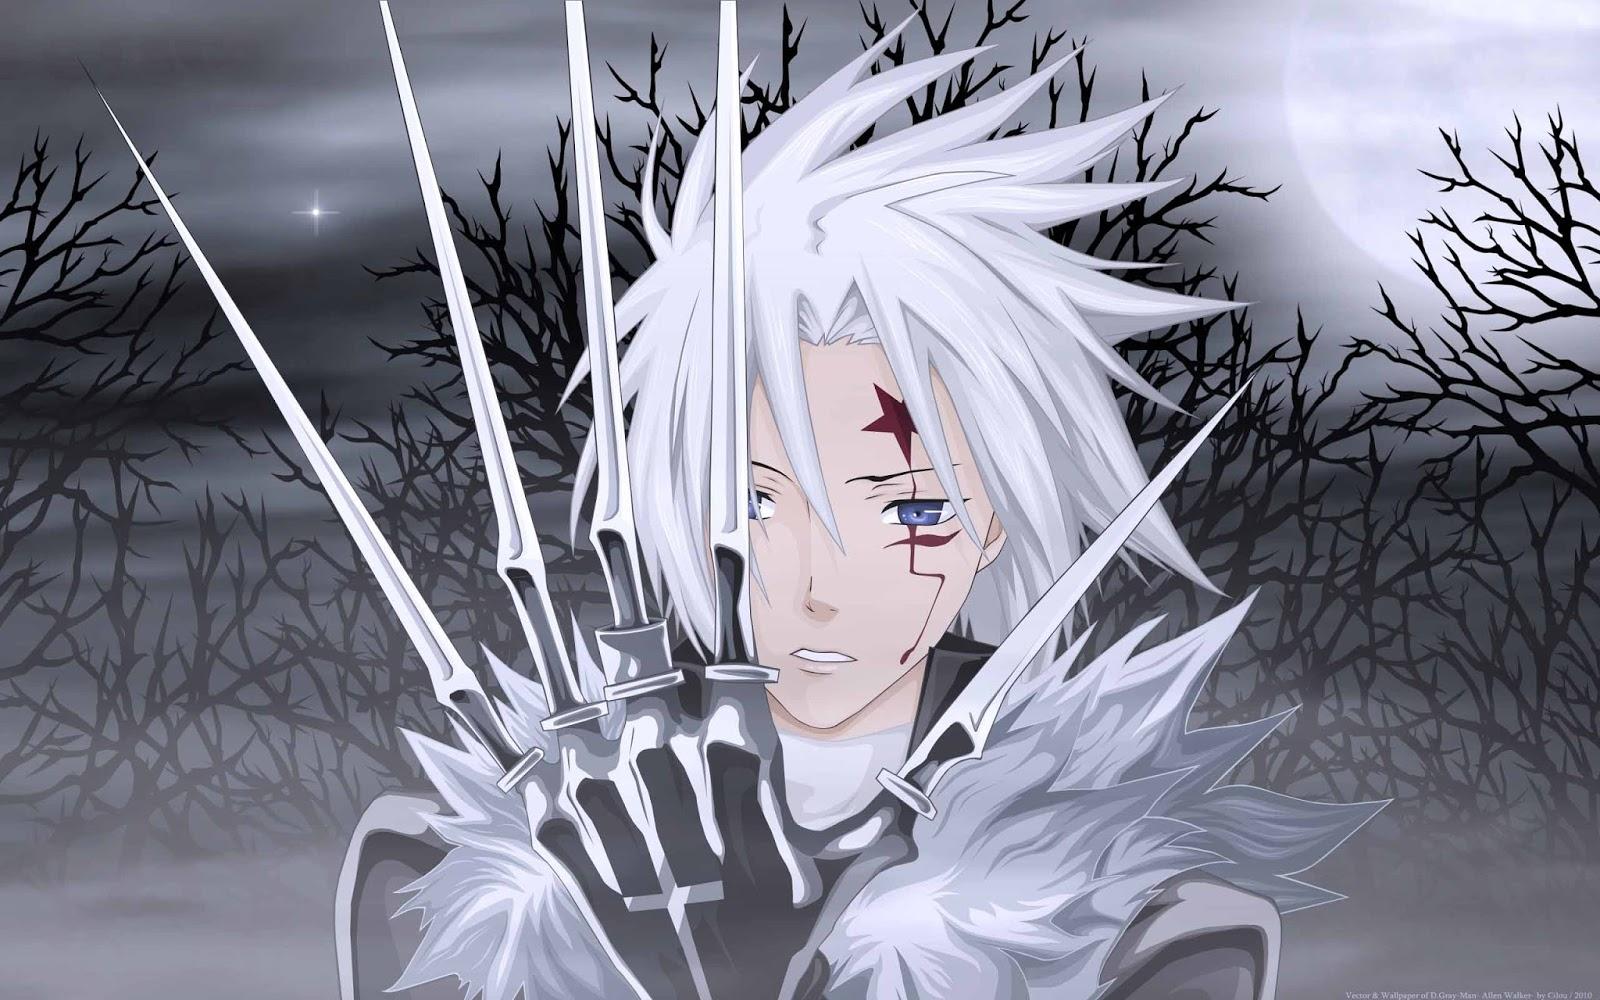 Hq wallpapers d gray man wallpapers - 3d anime wallpaper ...